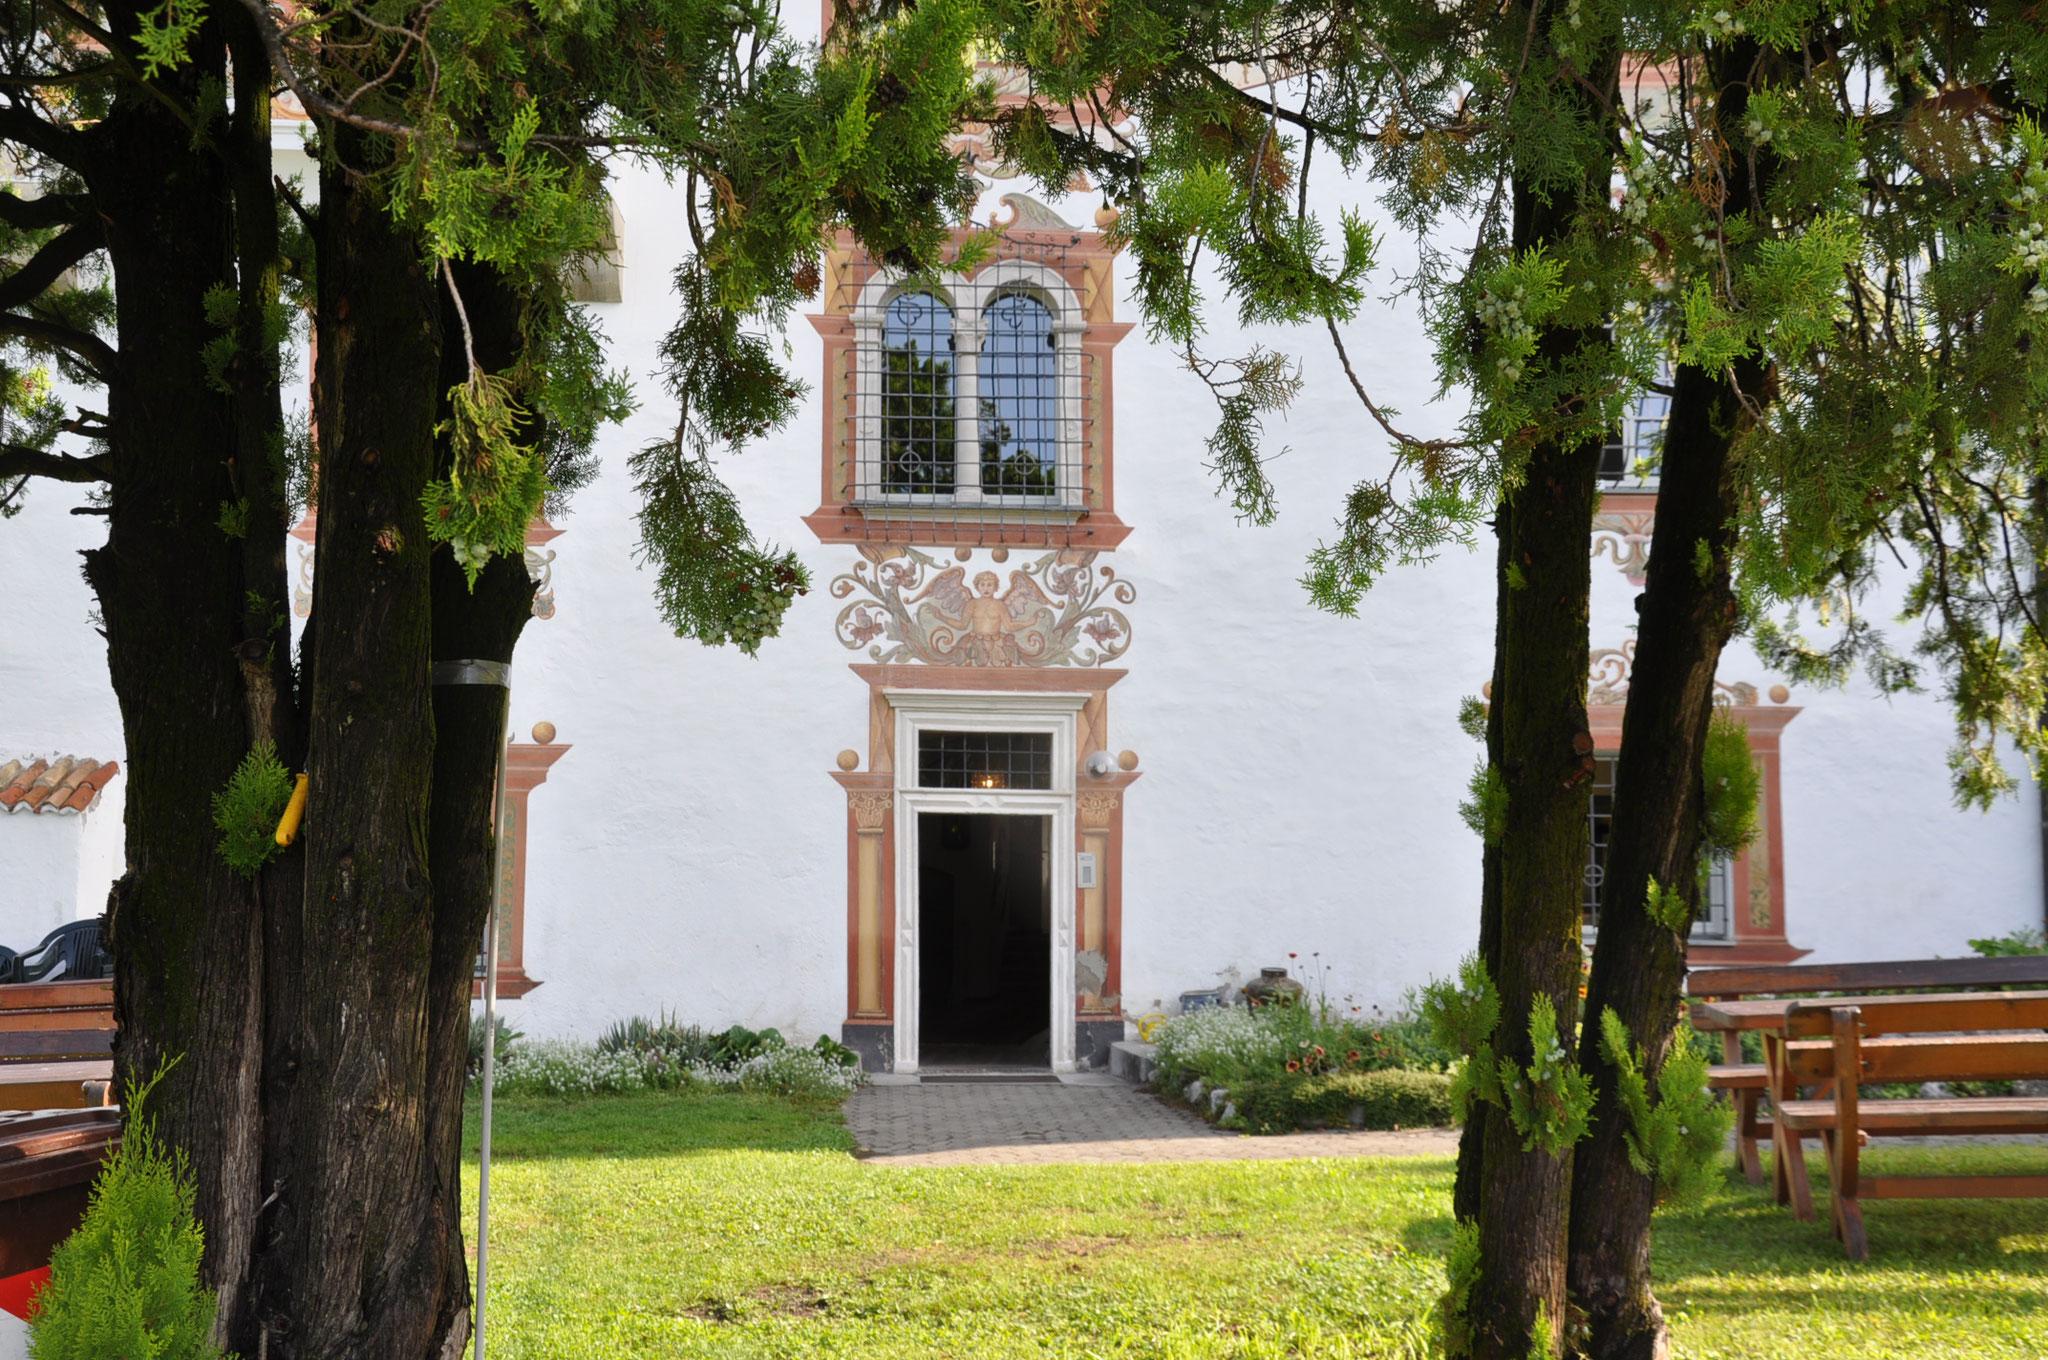 Das Gästehaus Casa Pallotti in Meran